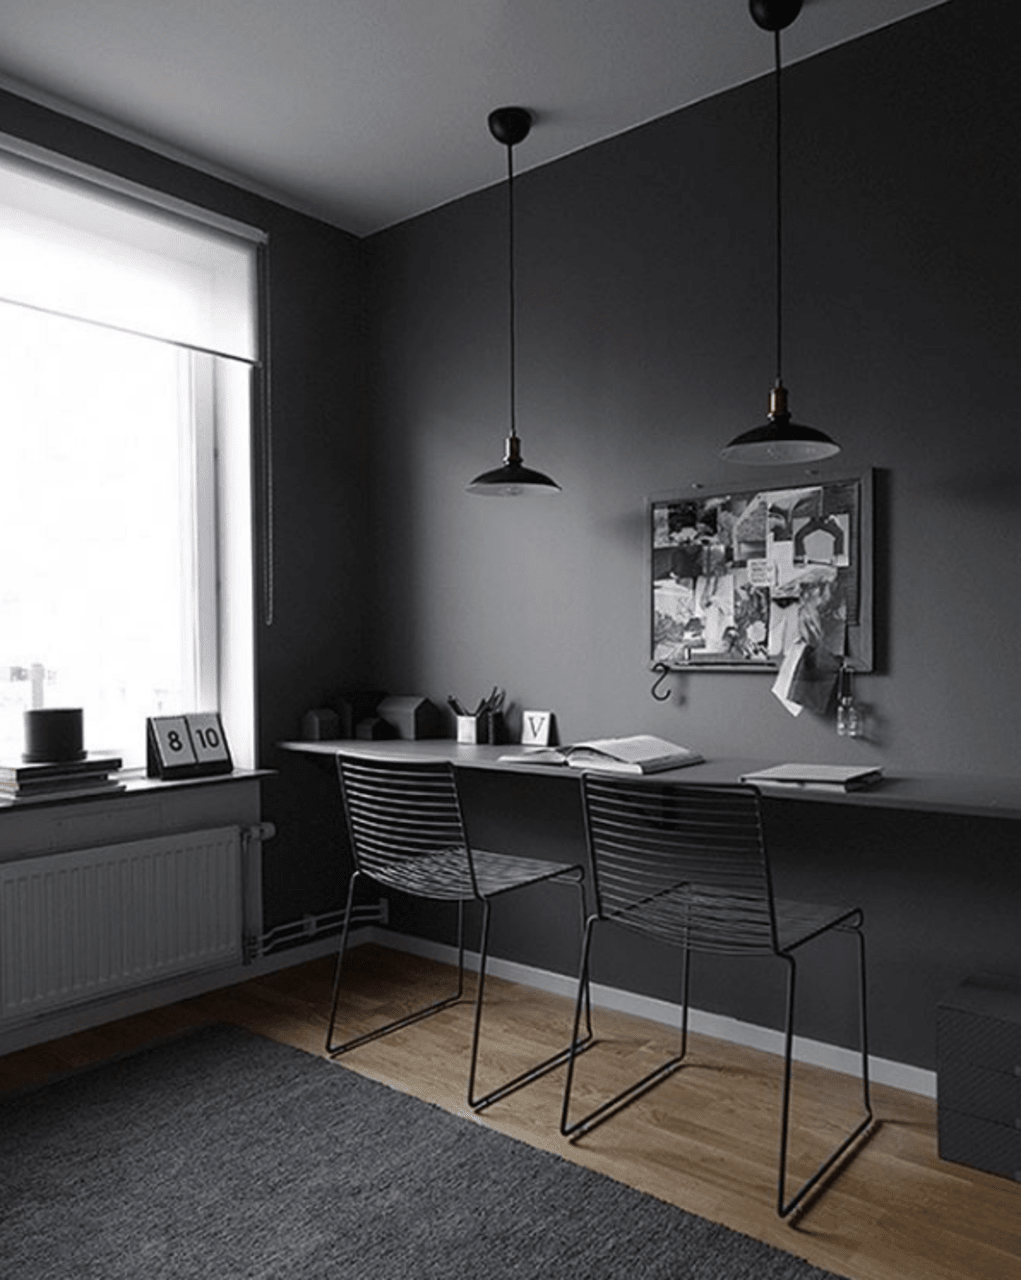 Minimal Interior Design Inspiration 53   Minimalism interior, Minimal interior design, Interior ...